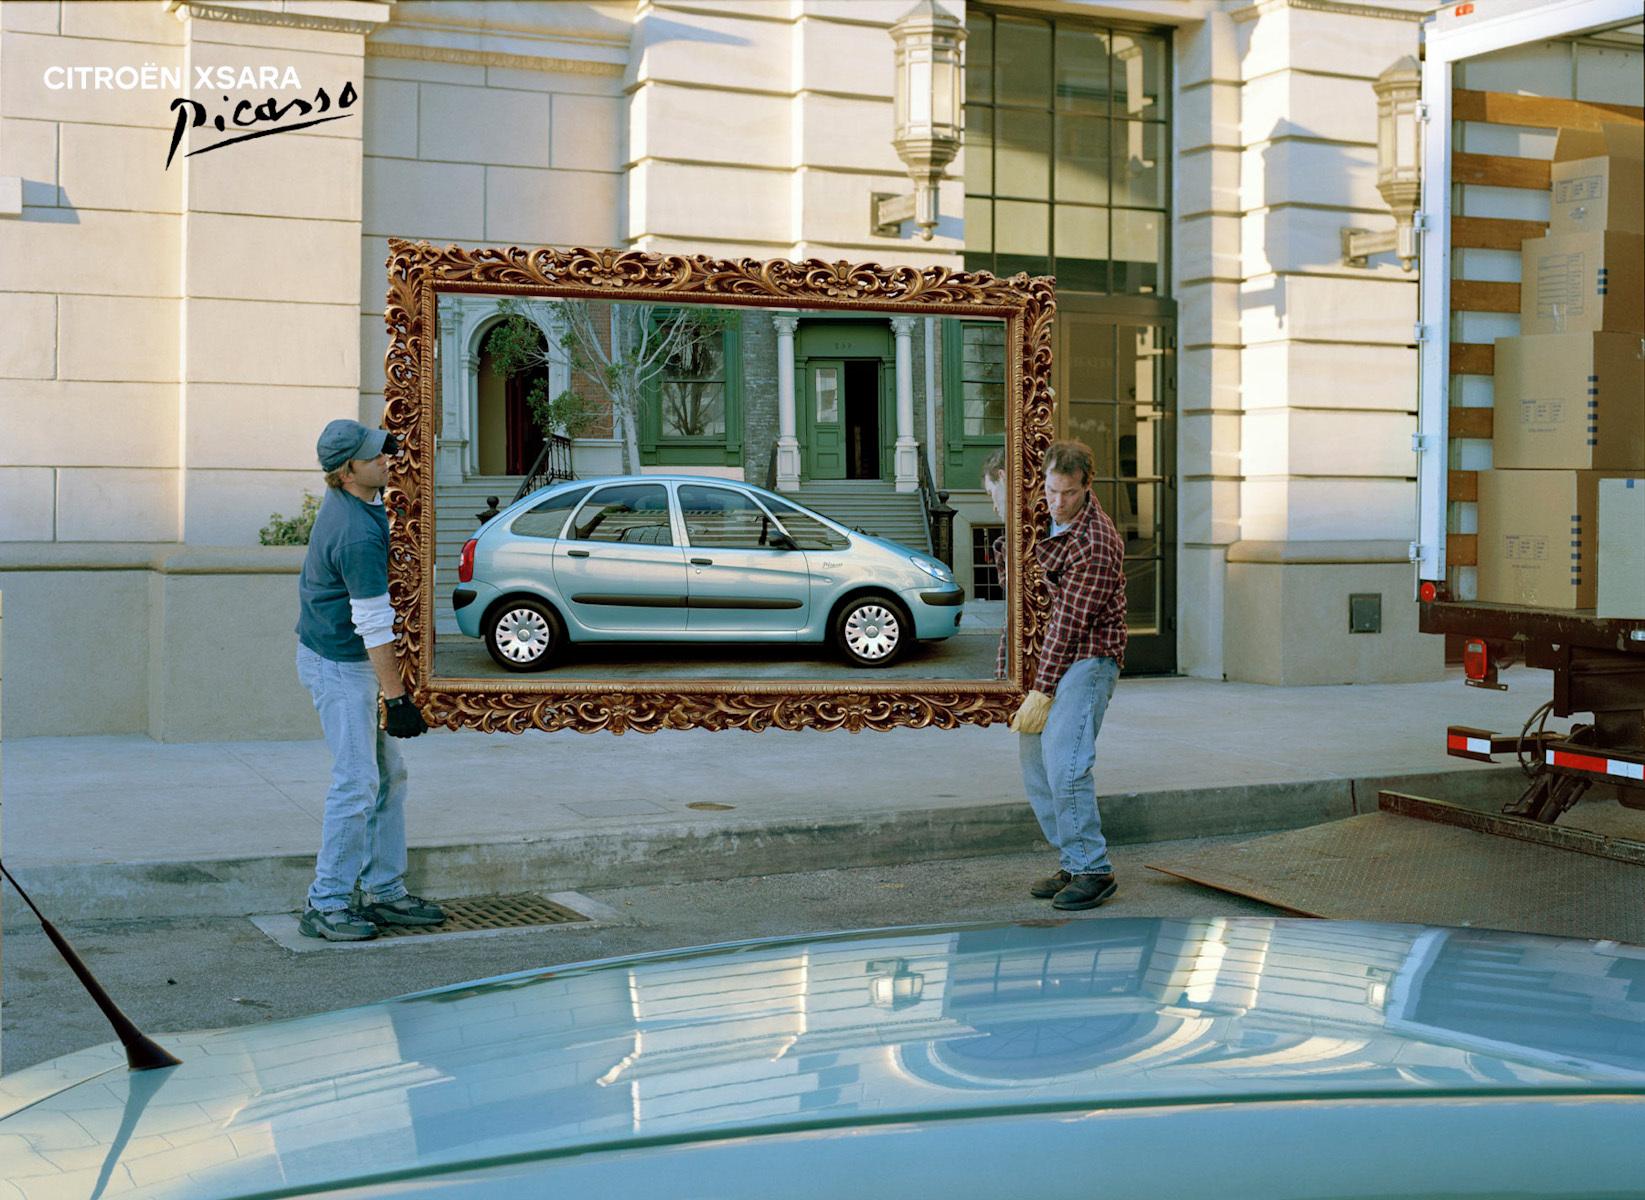 Picasso Mirror.jpg